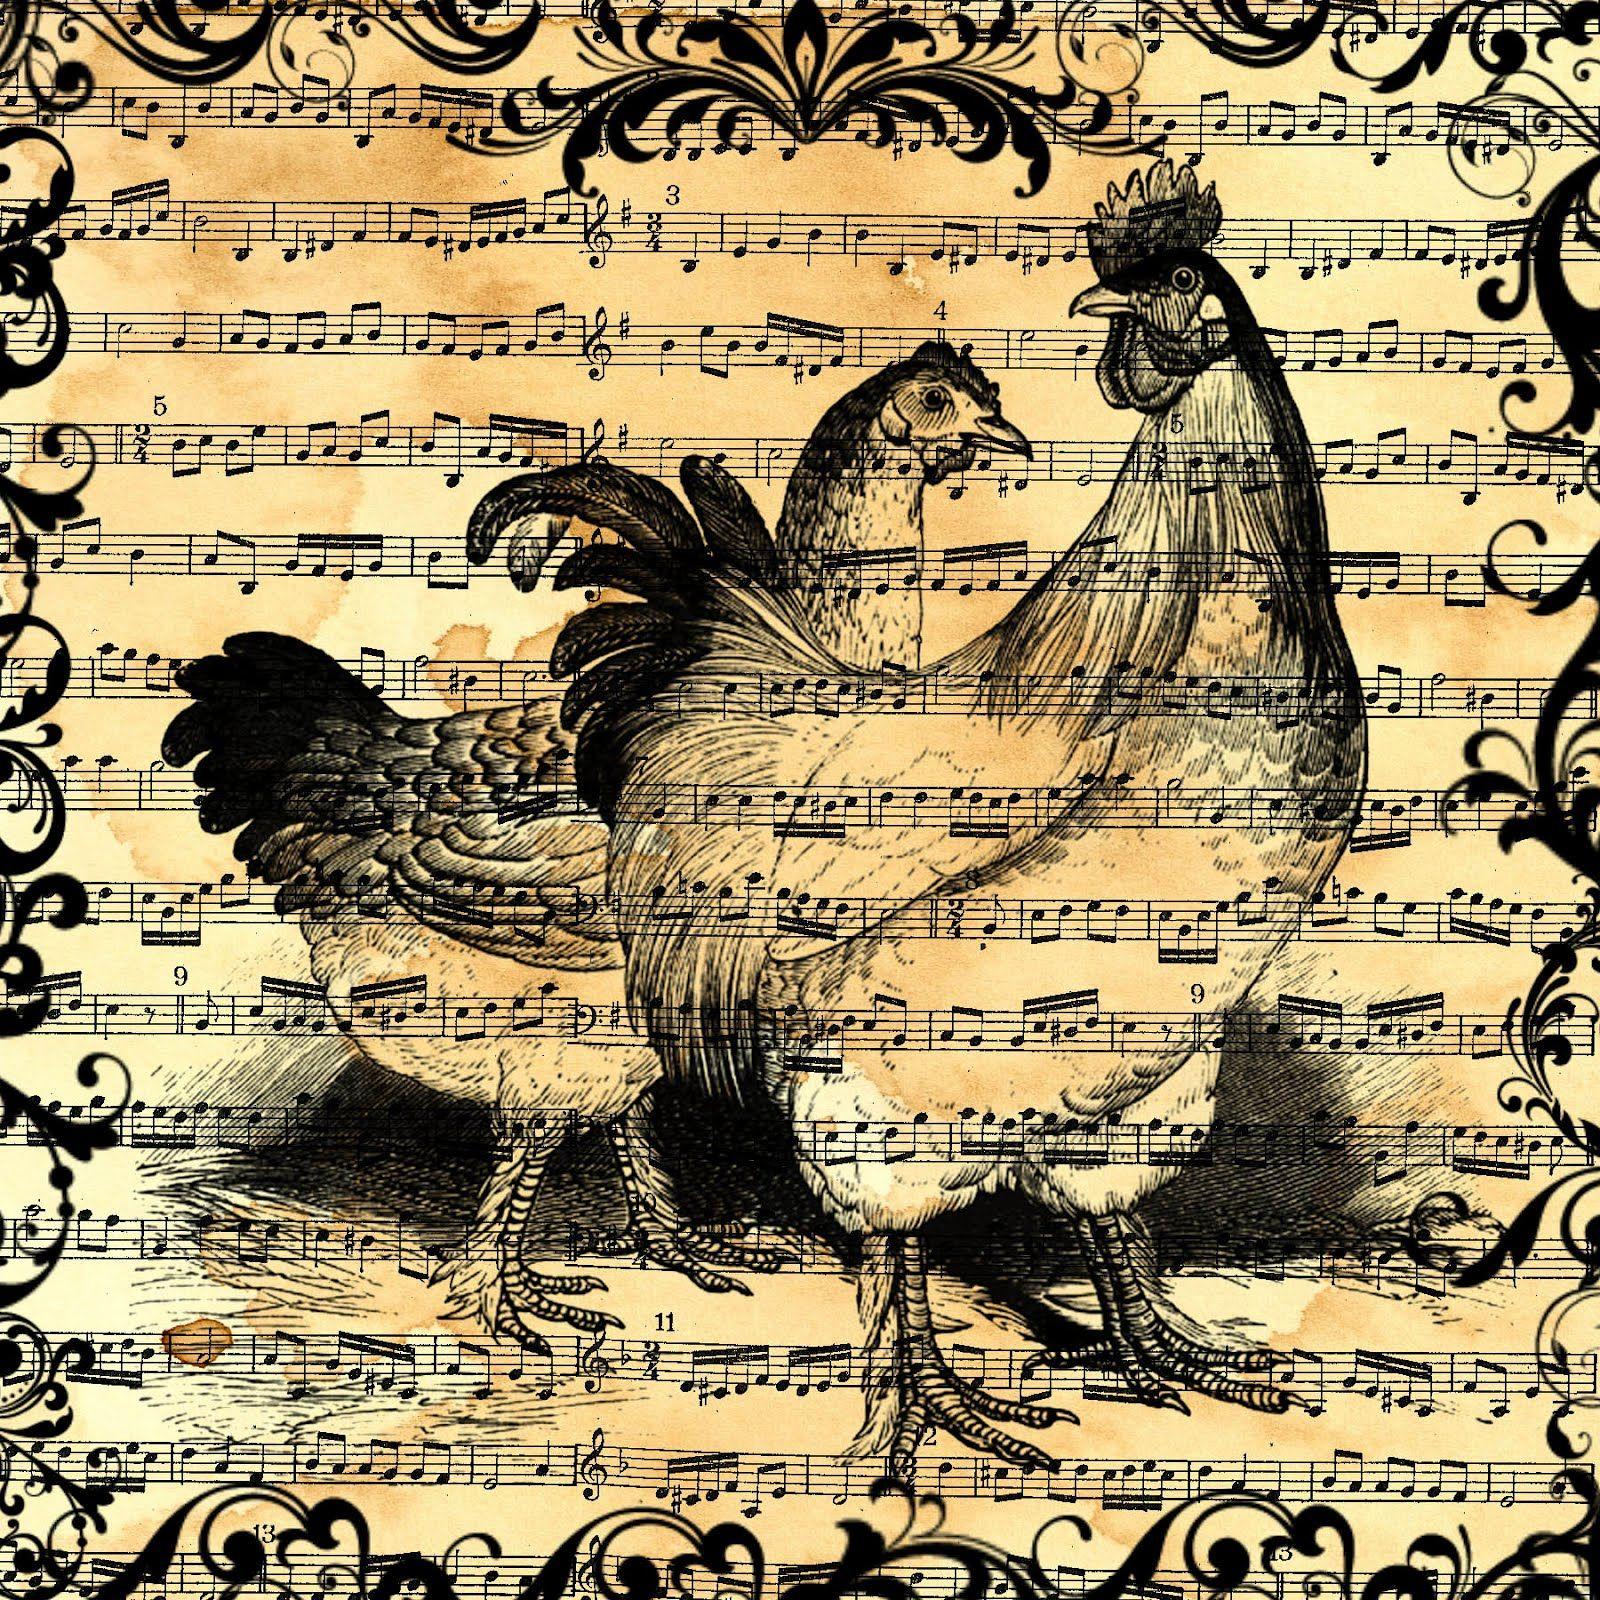 Grungy Sheet Music Chicken Collage